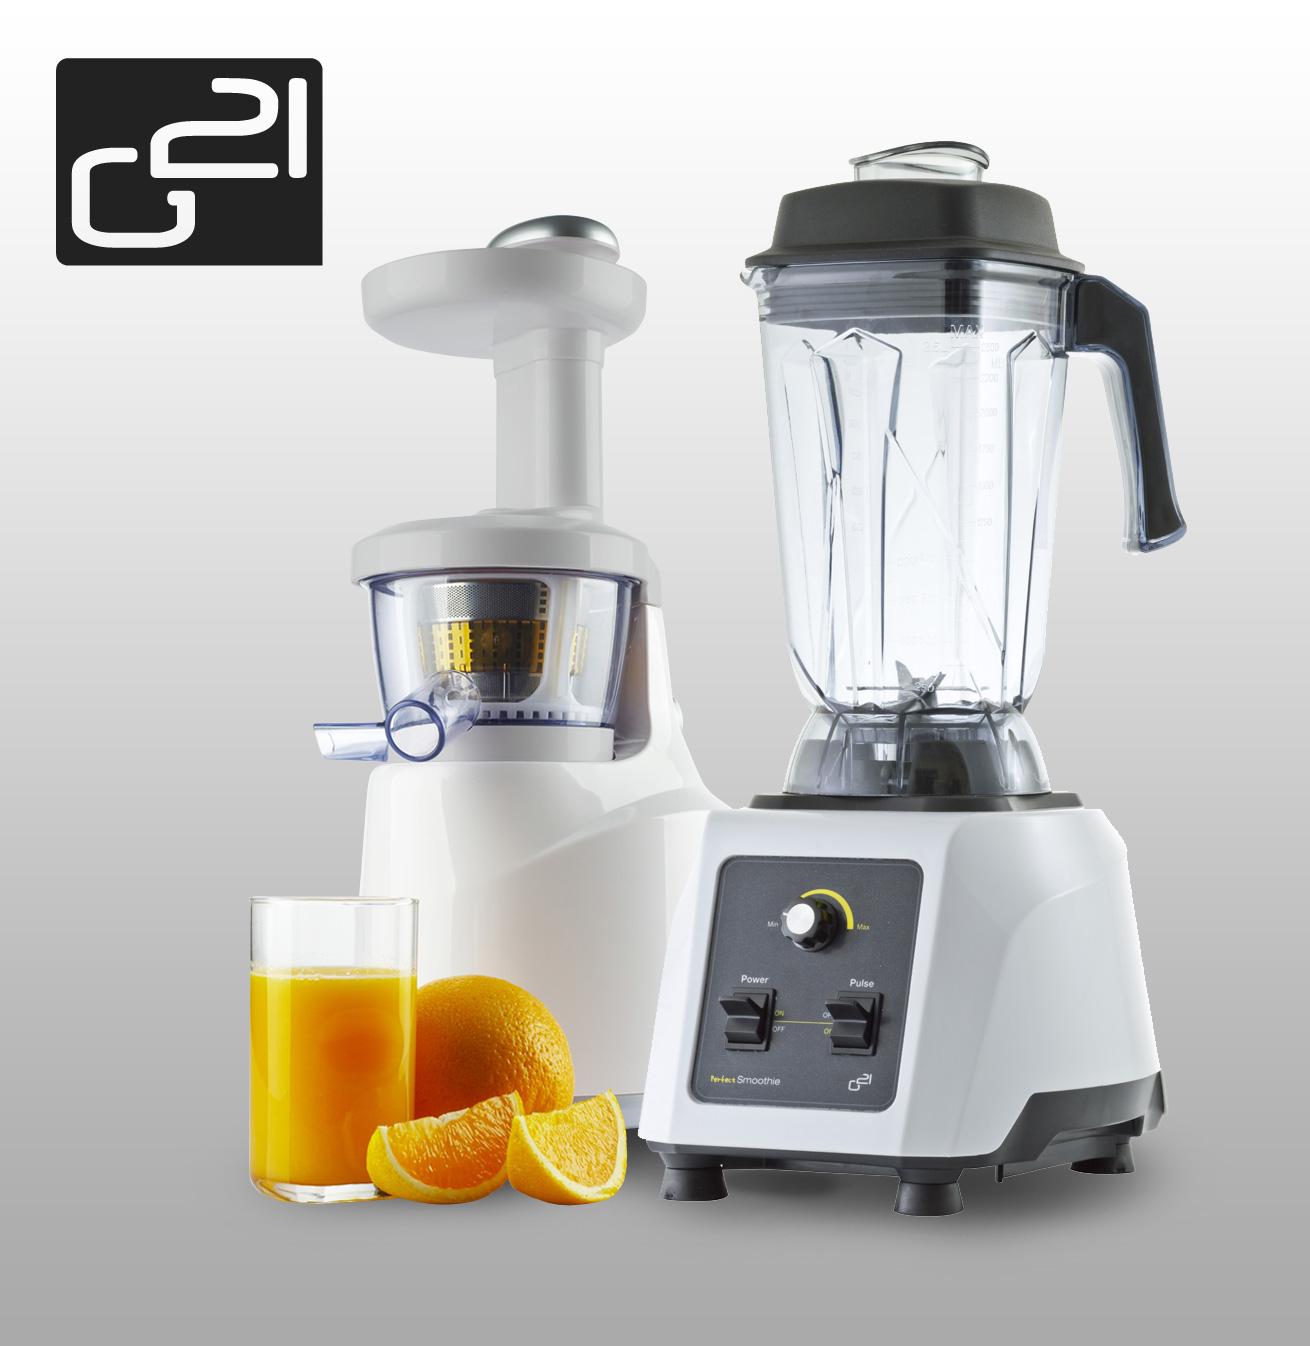 Set G21 blender perfect smoothie + perfect juicer white